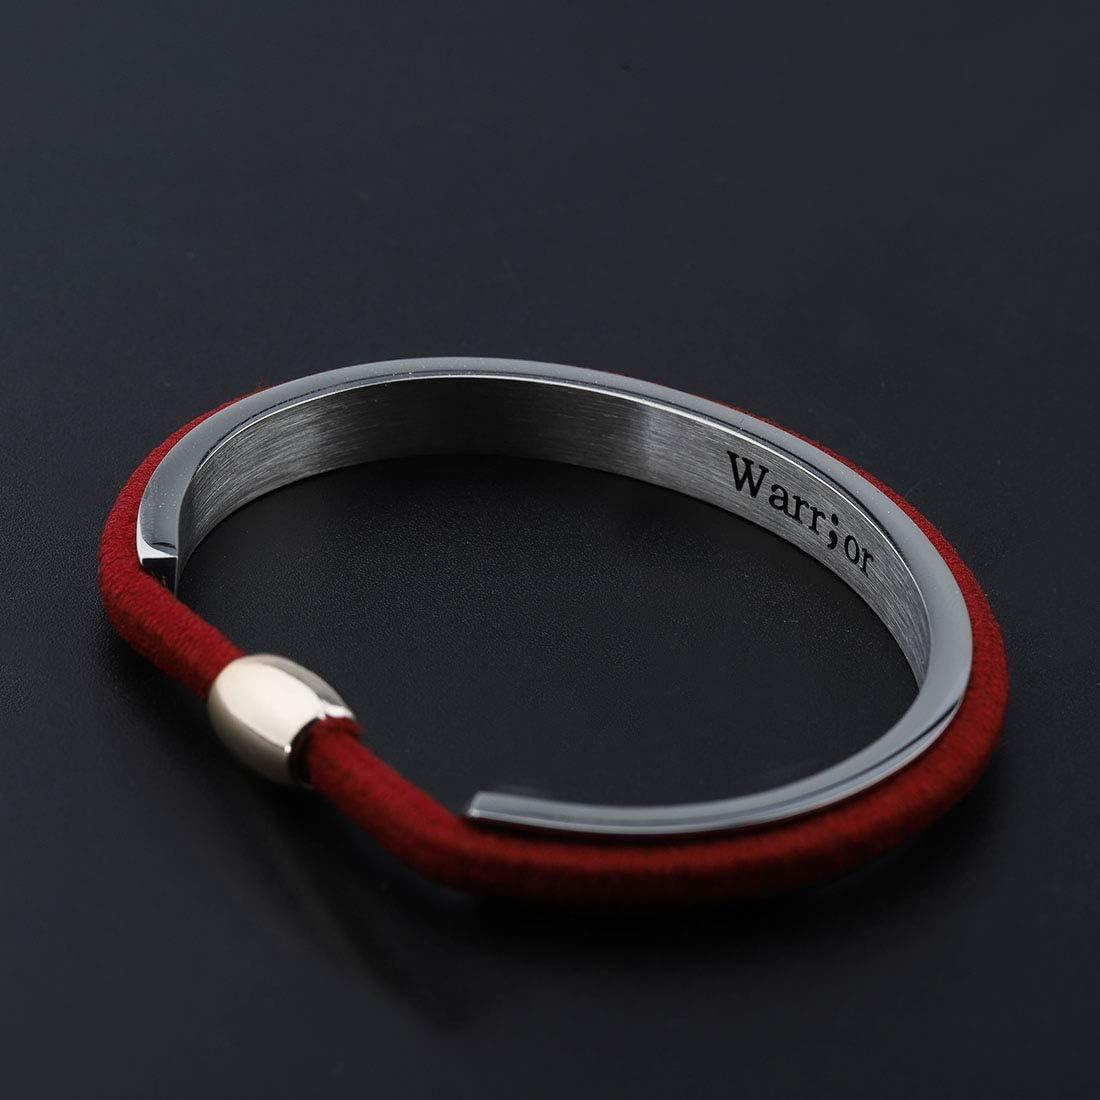 Zuo Bao Semicolon Jewelry Hair Tie Bracelet Fighter Semicolon Cuff Bracelet Depression Awareness Semicolon Bracelet